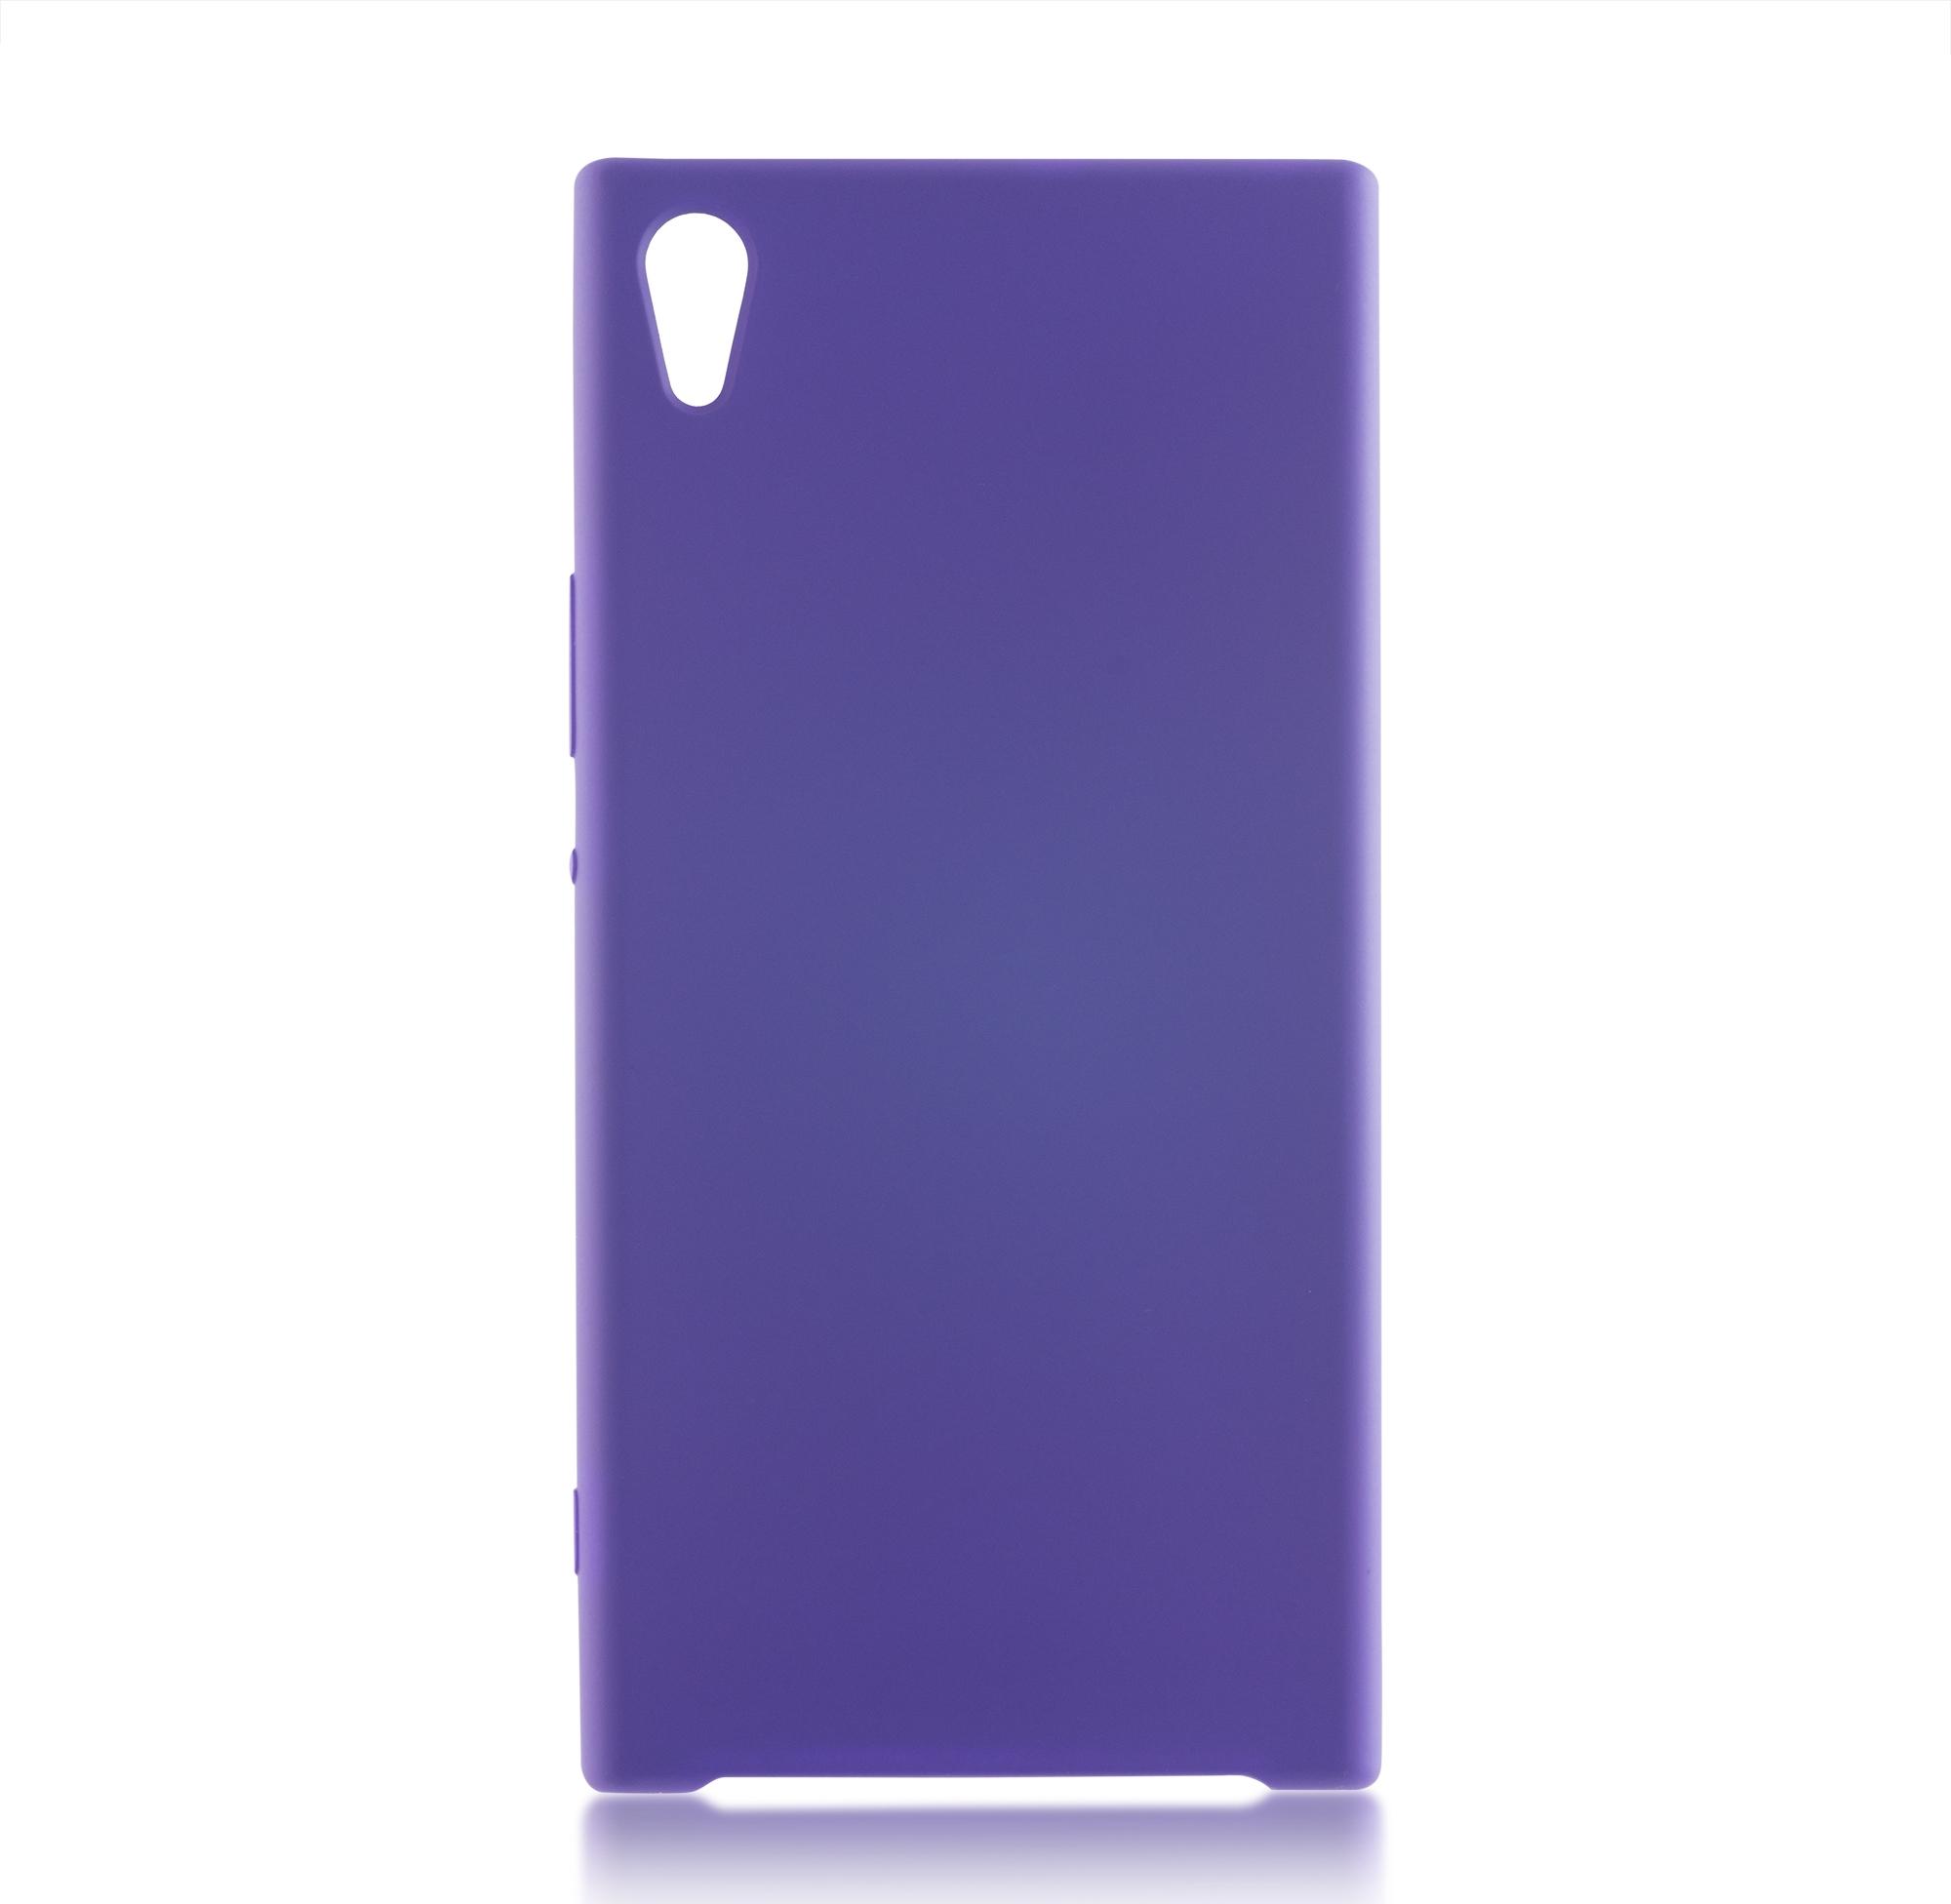 Чехол Brosco Softrubber для Sony Xperia XA1 Ultra, фиолетовый цена и фото